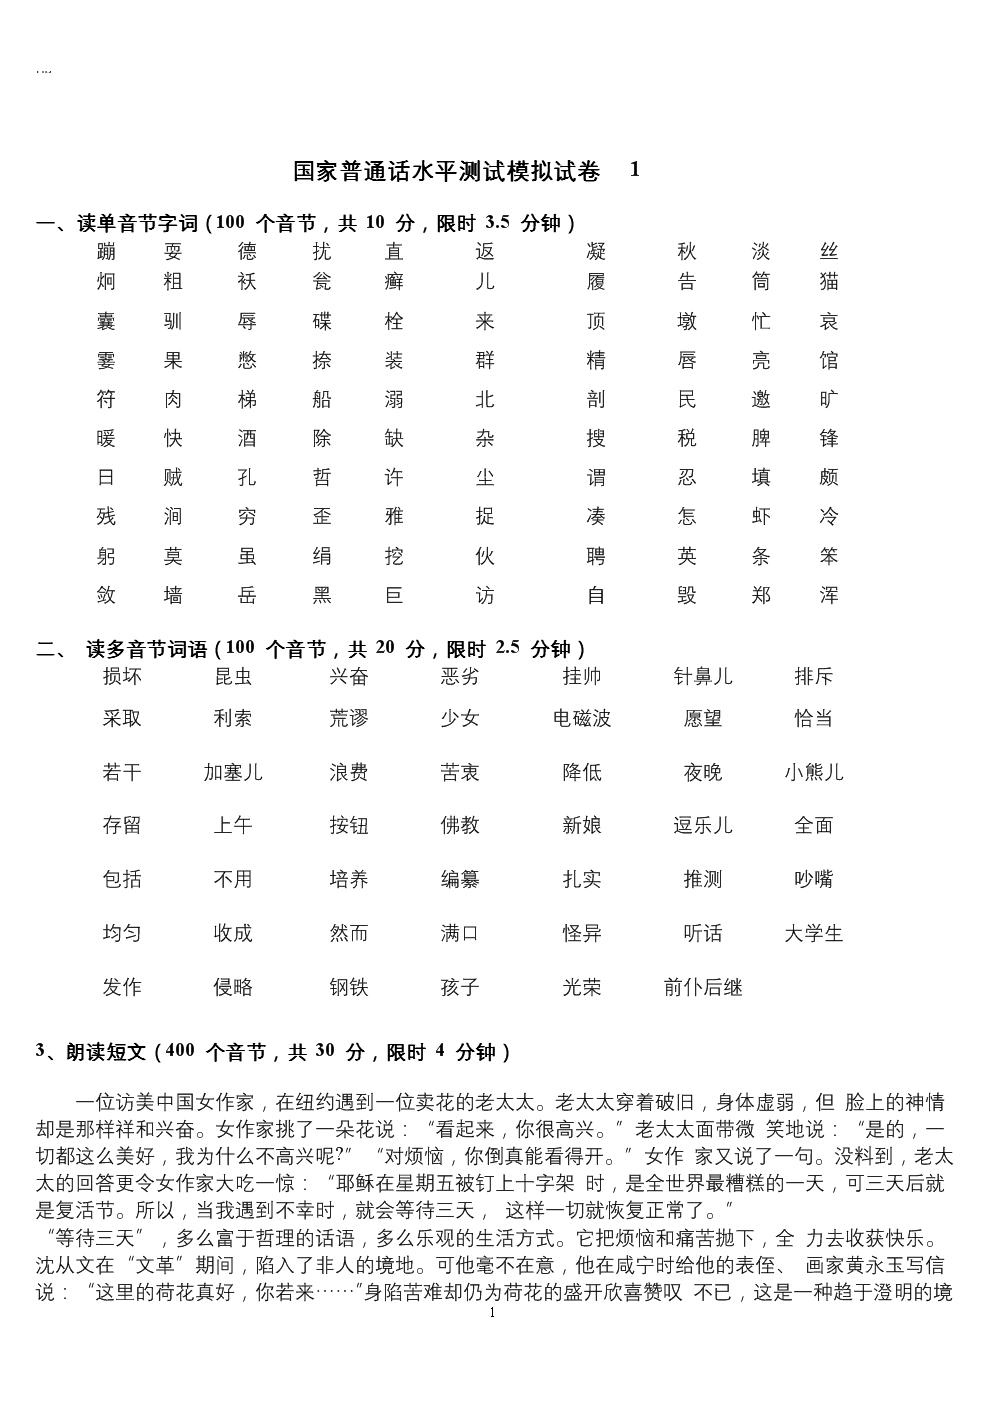 doc 17页图片